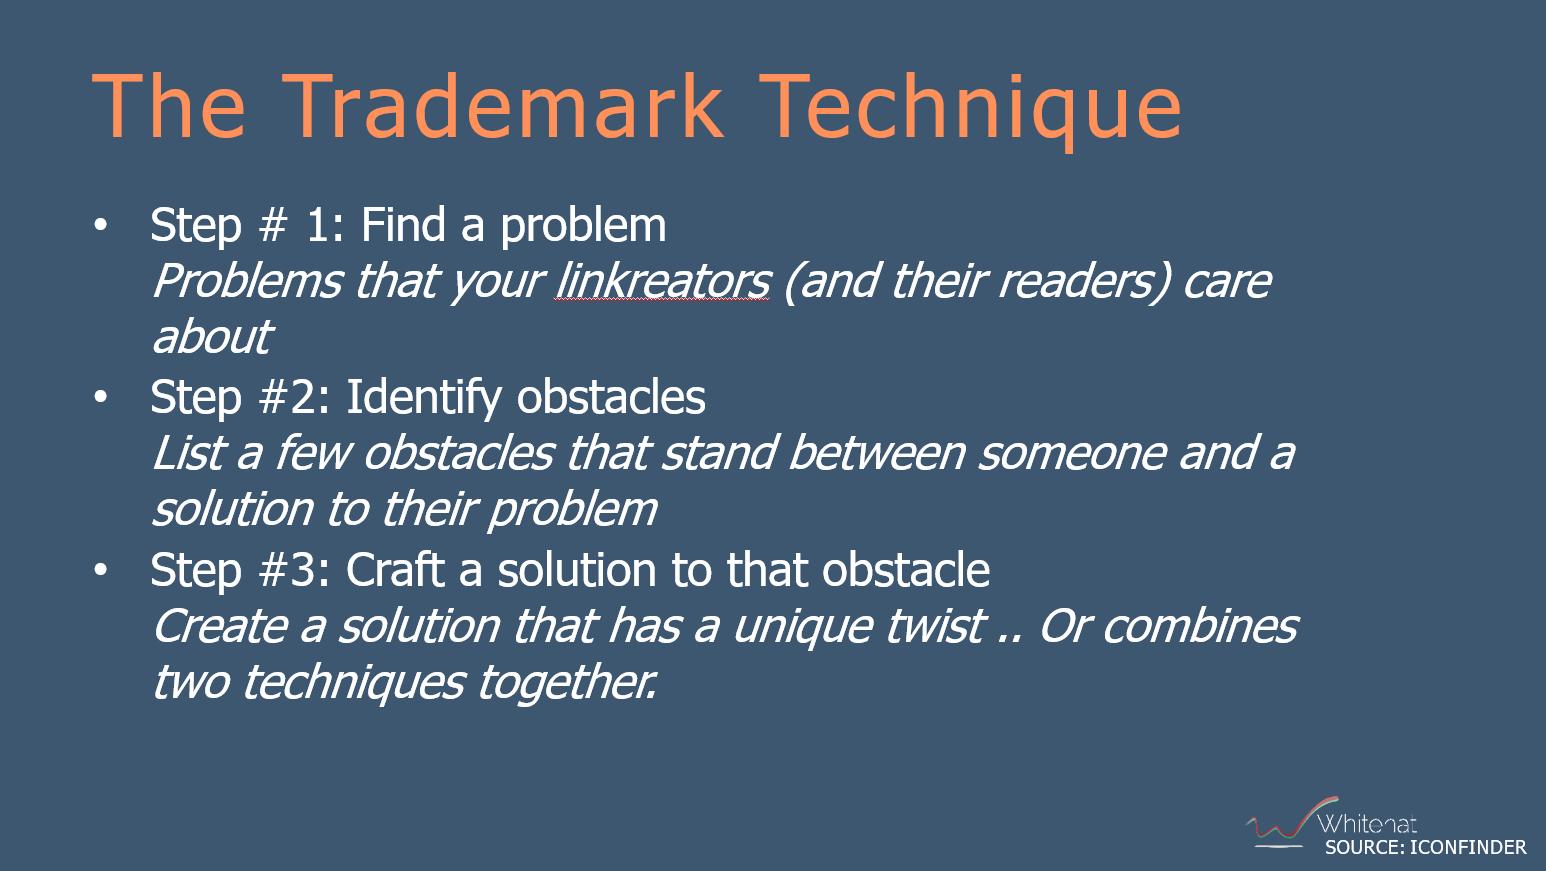 trademark-technique-steps